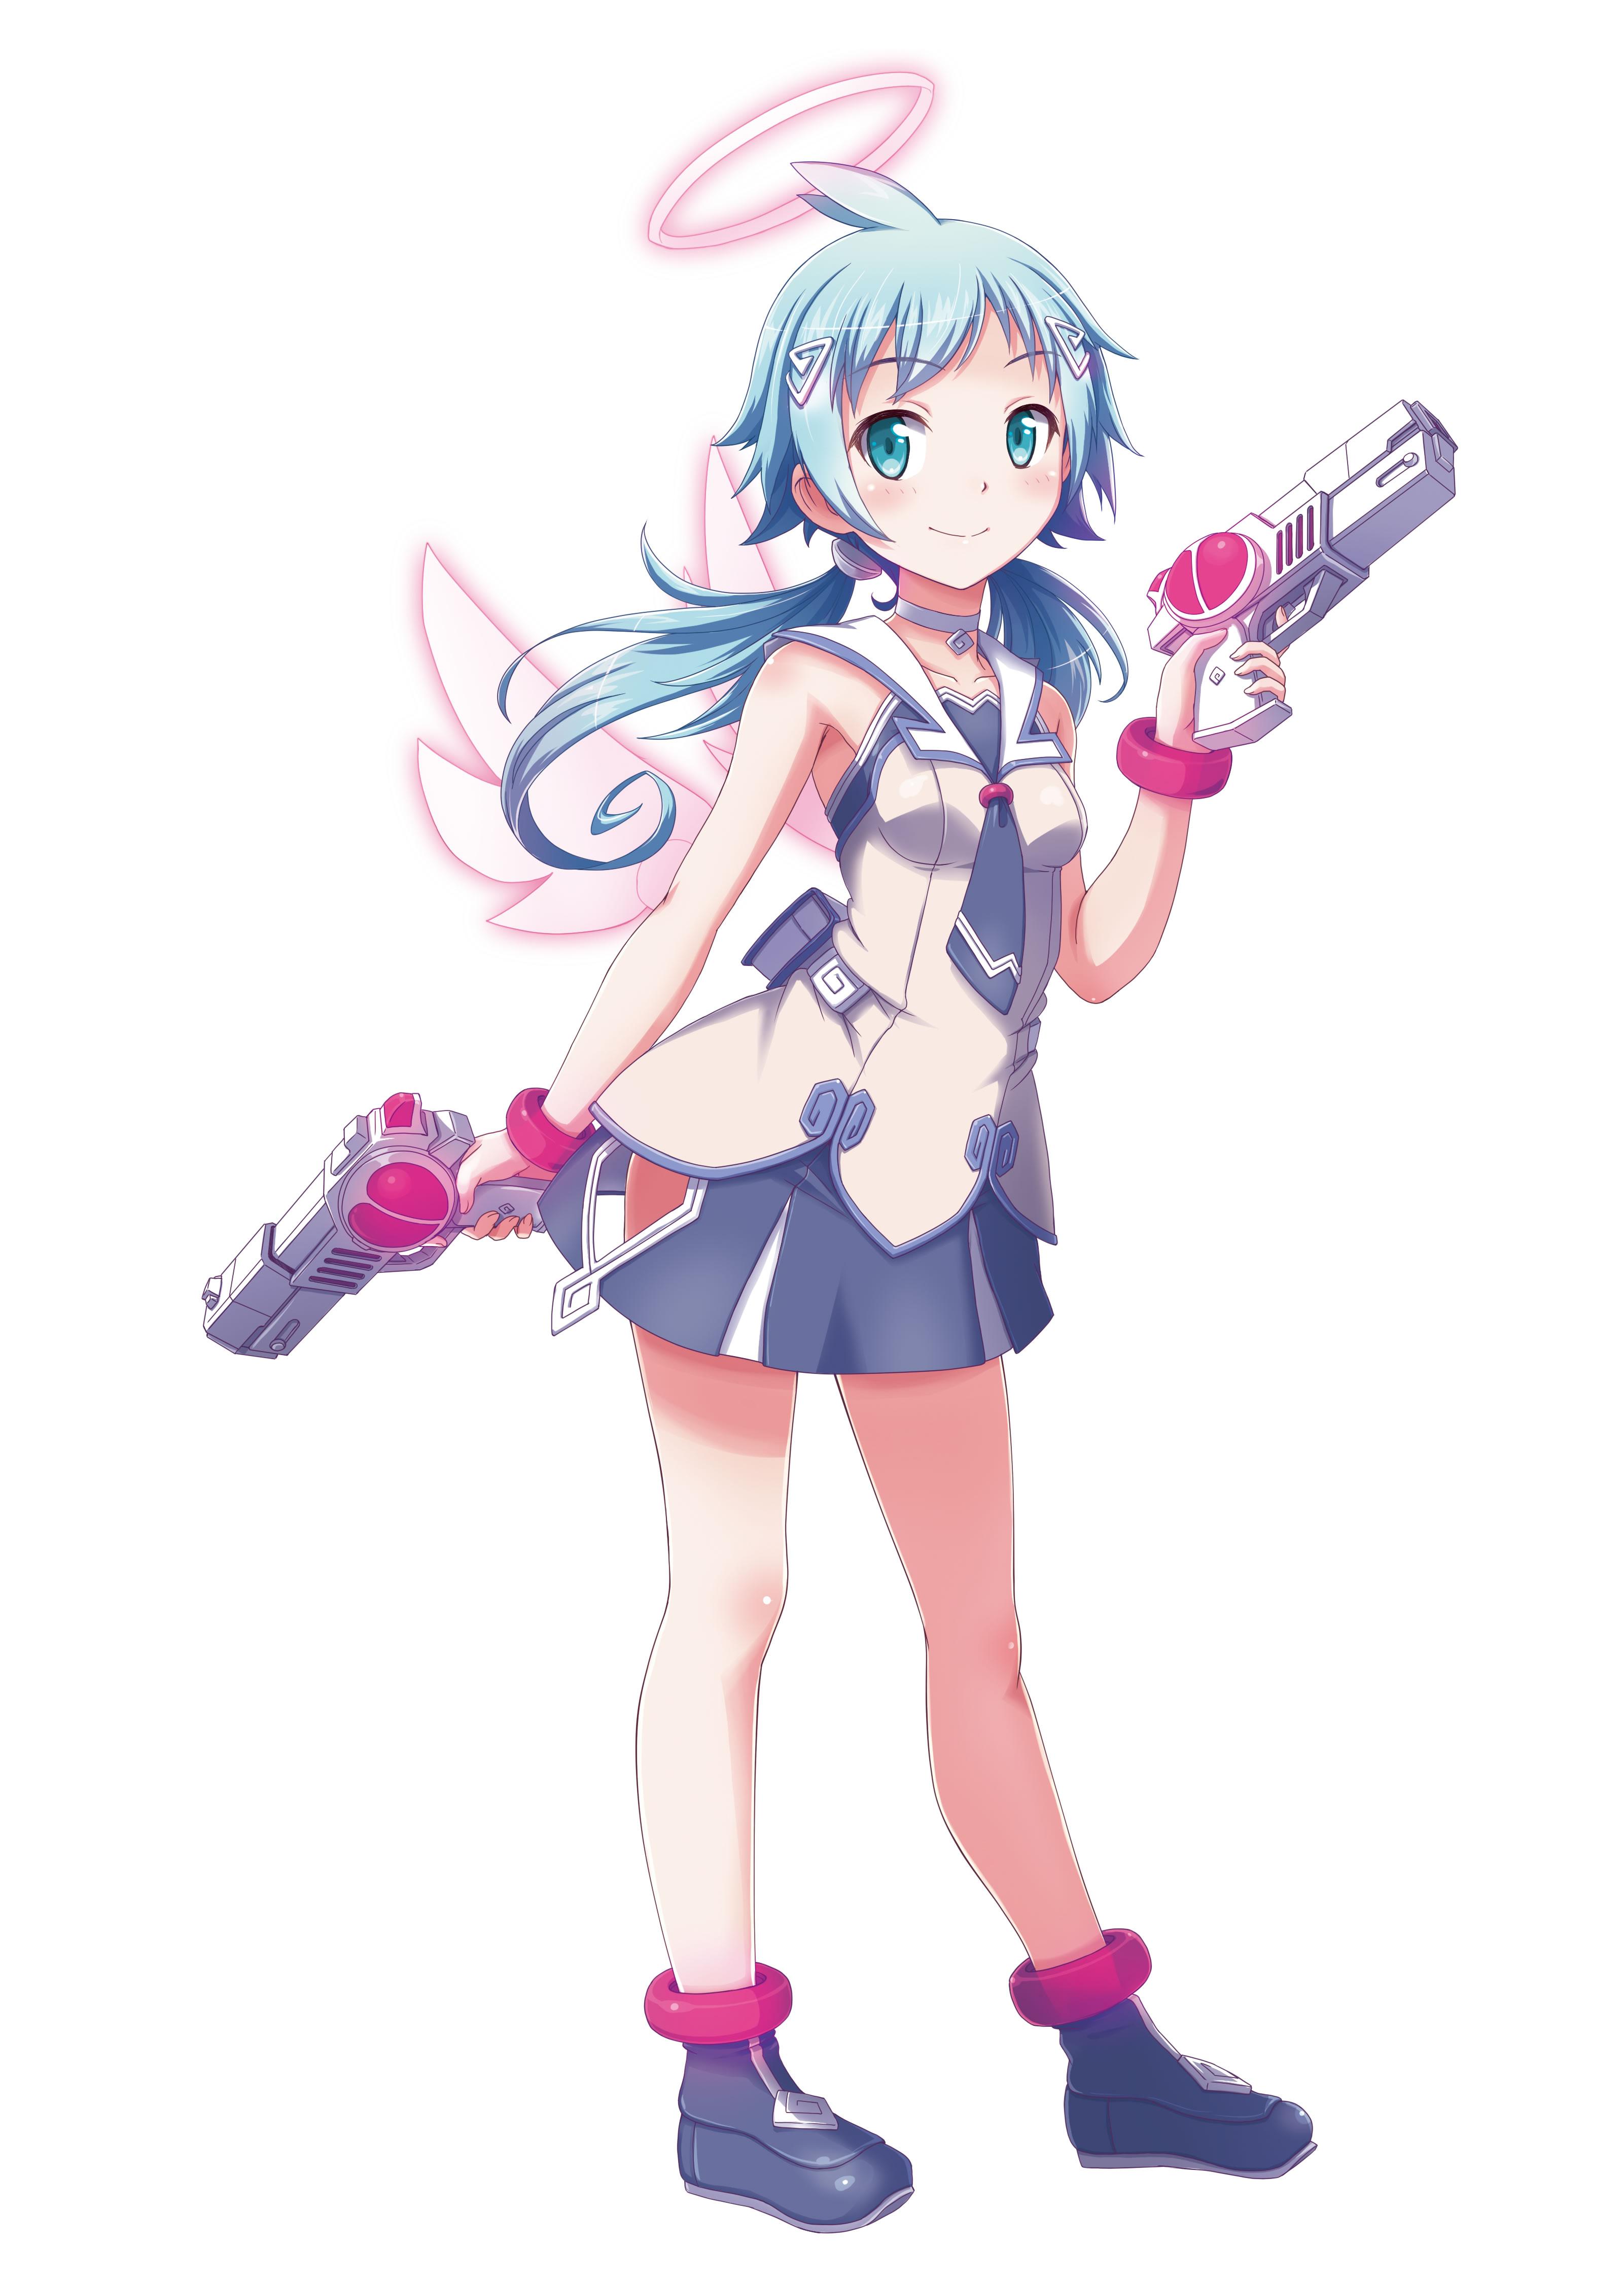 4 armed girl hentai fucking amazing